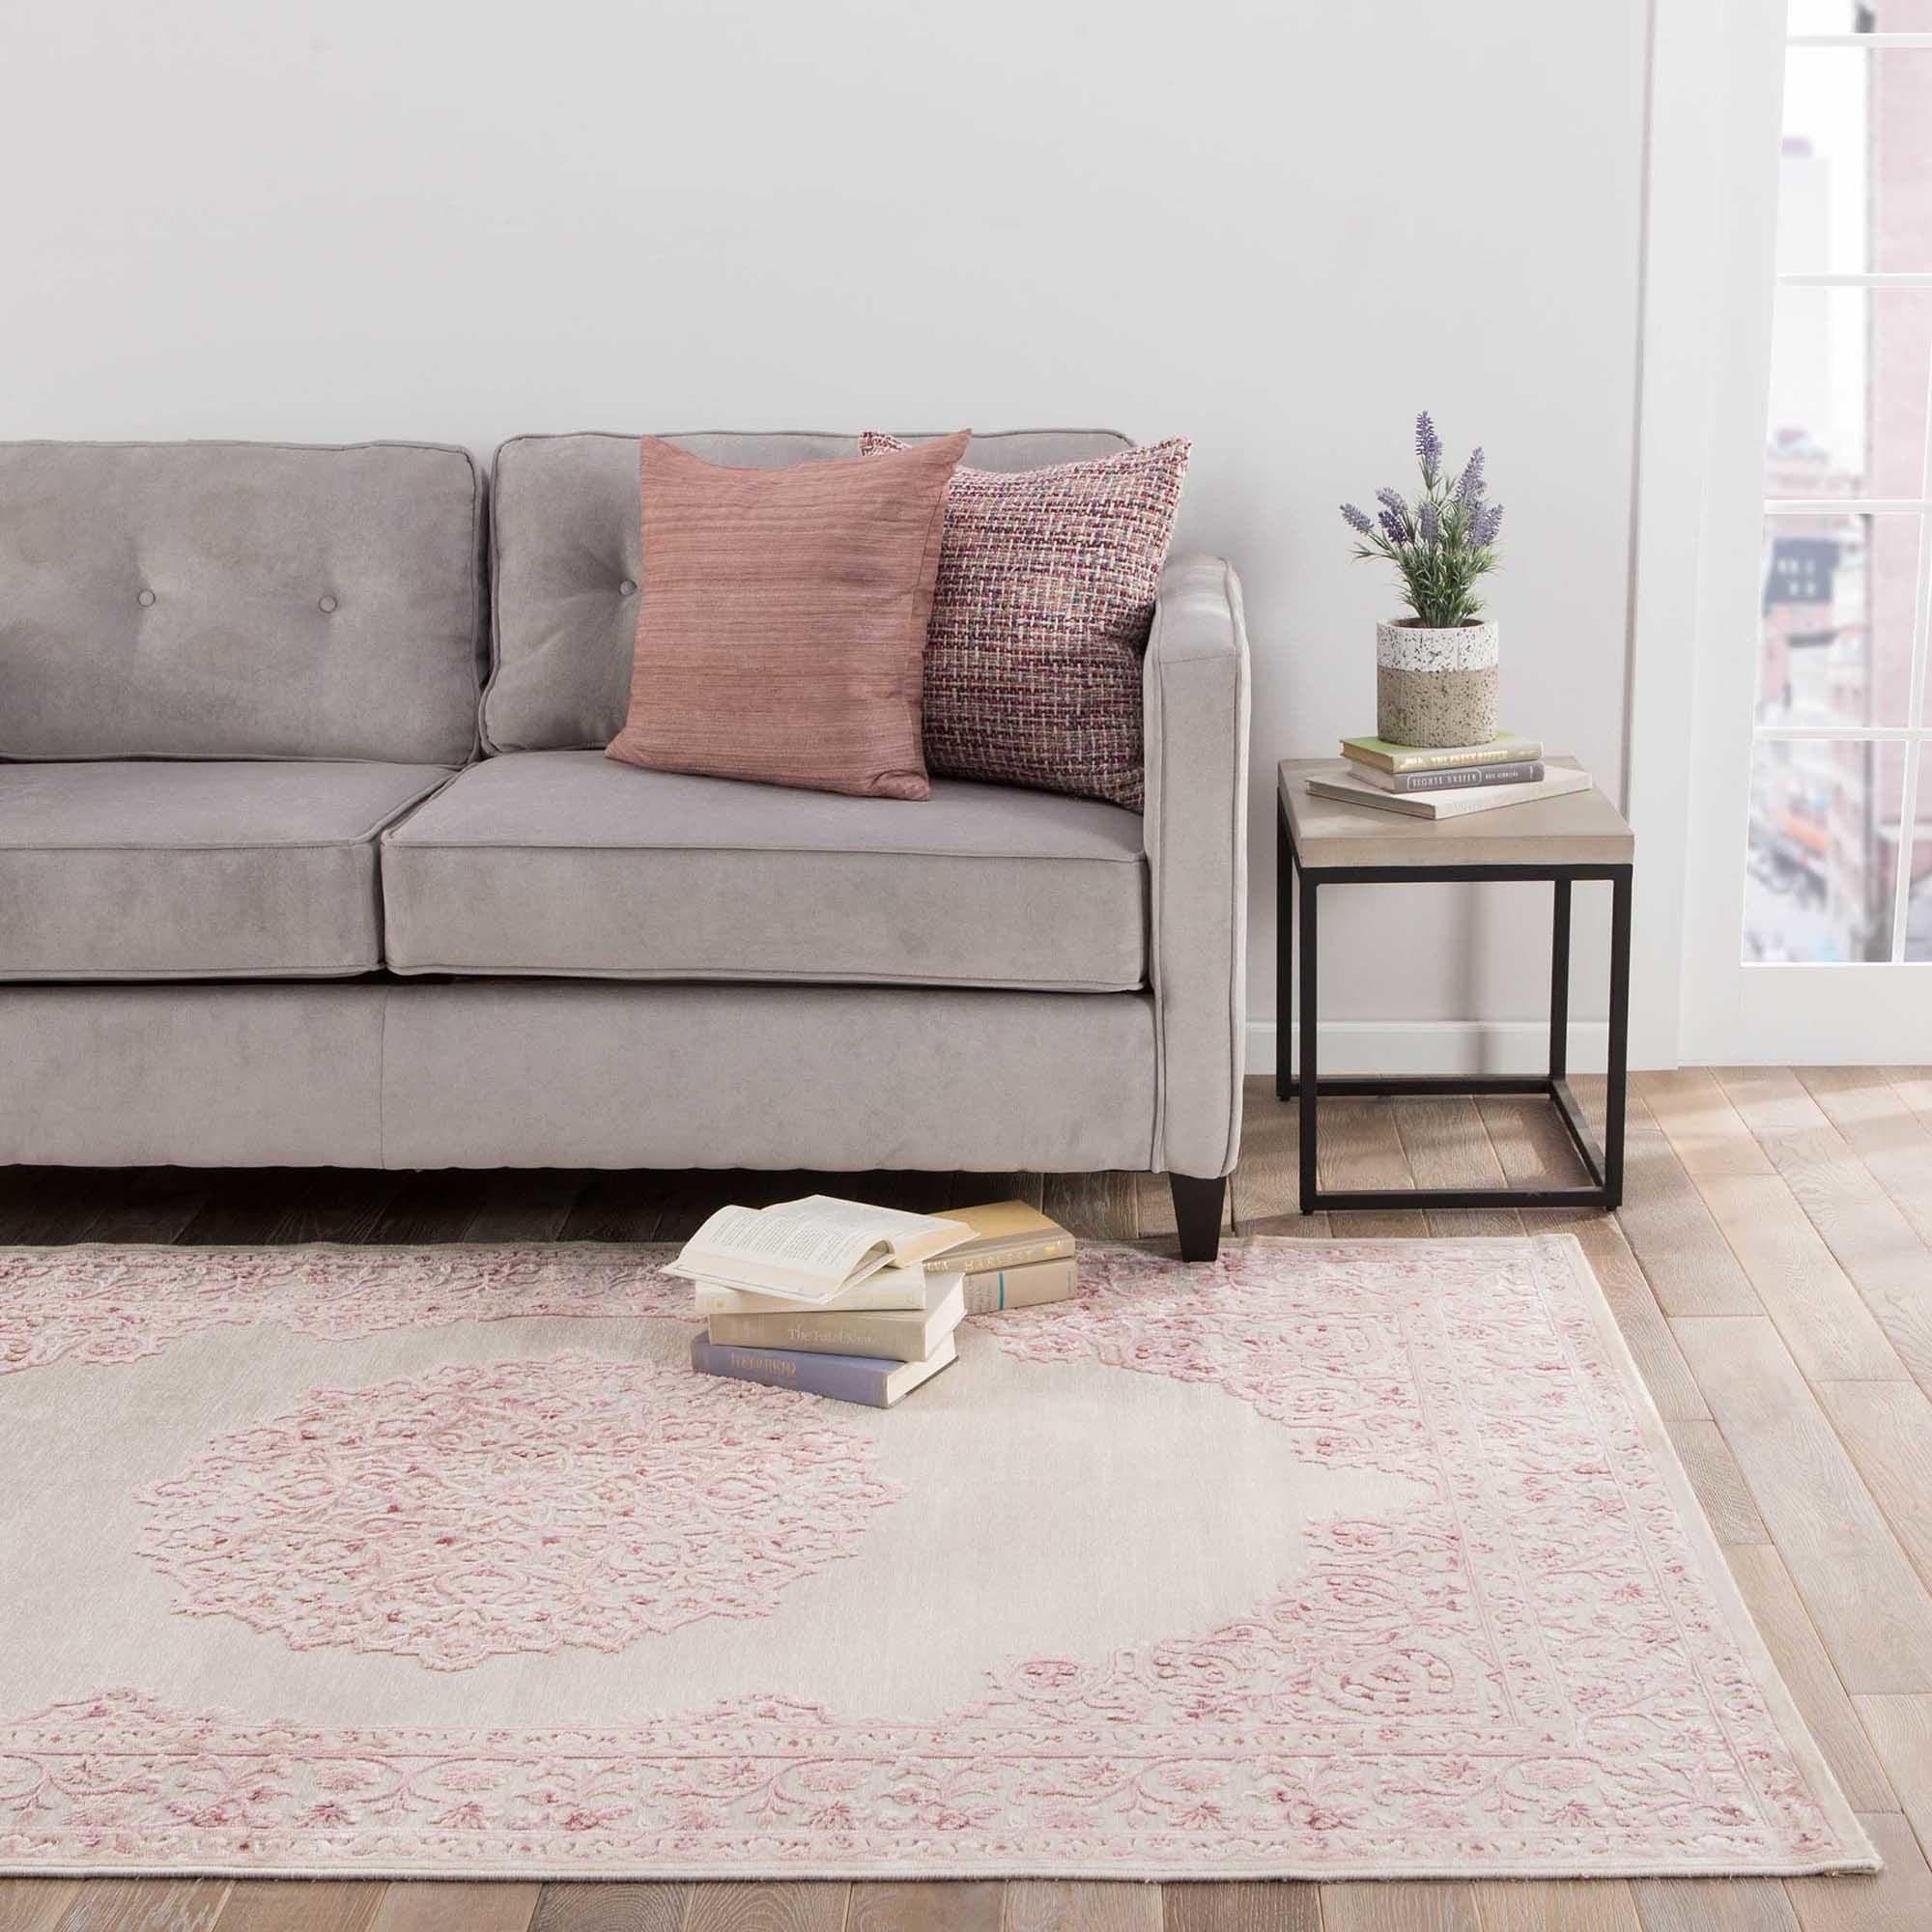 "Maison Rouge Edith Medallion Pink/ White Area Rug (5' x 7'6"")"